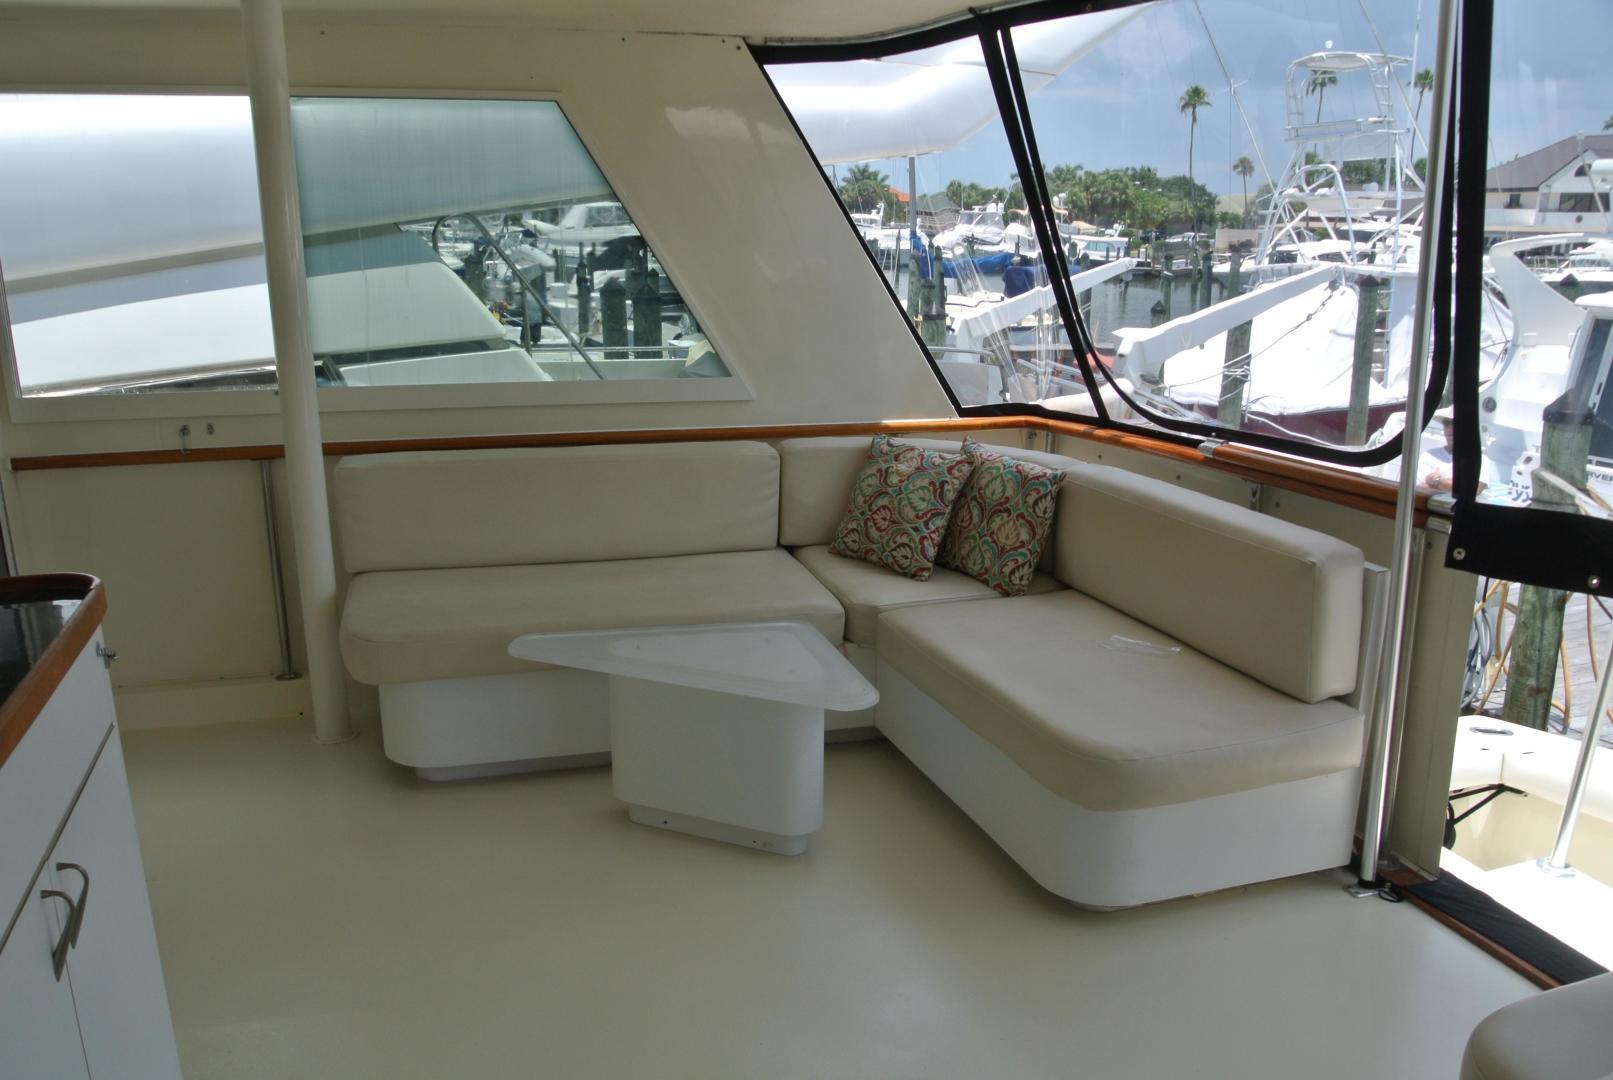 Hatteras-67-Cockpit-Motor-Yacht-1988-Lady-Encore-Saint-Petersburg-Florida-United-States-Aft-Deck-926173